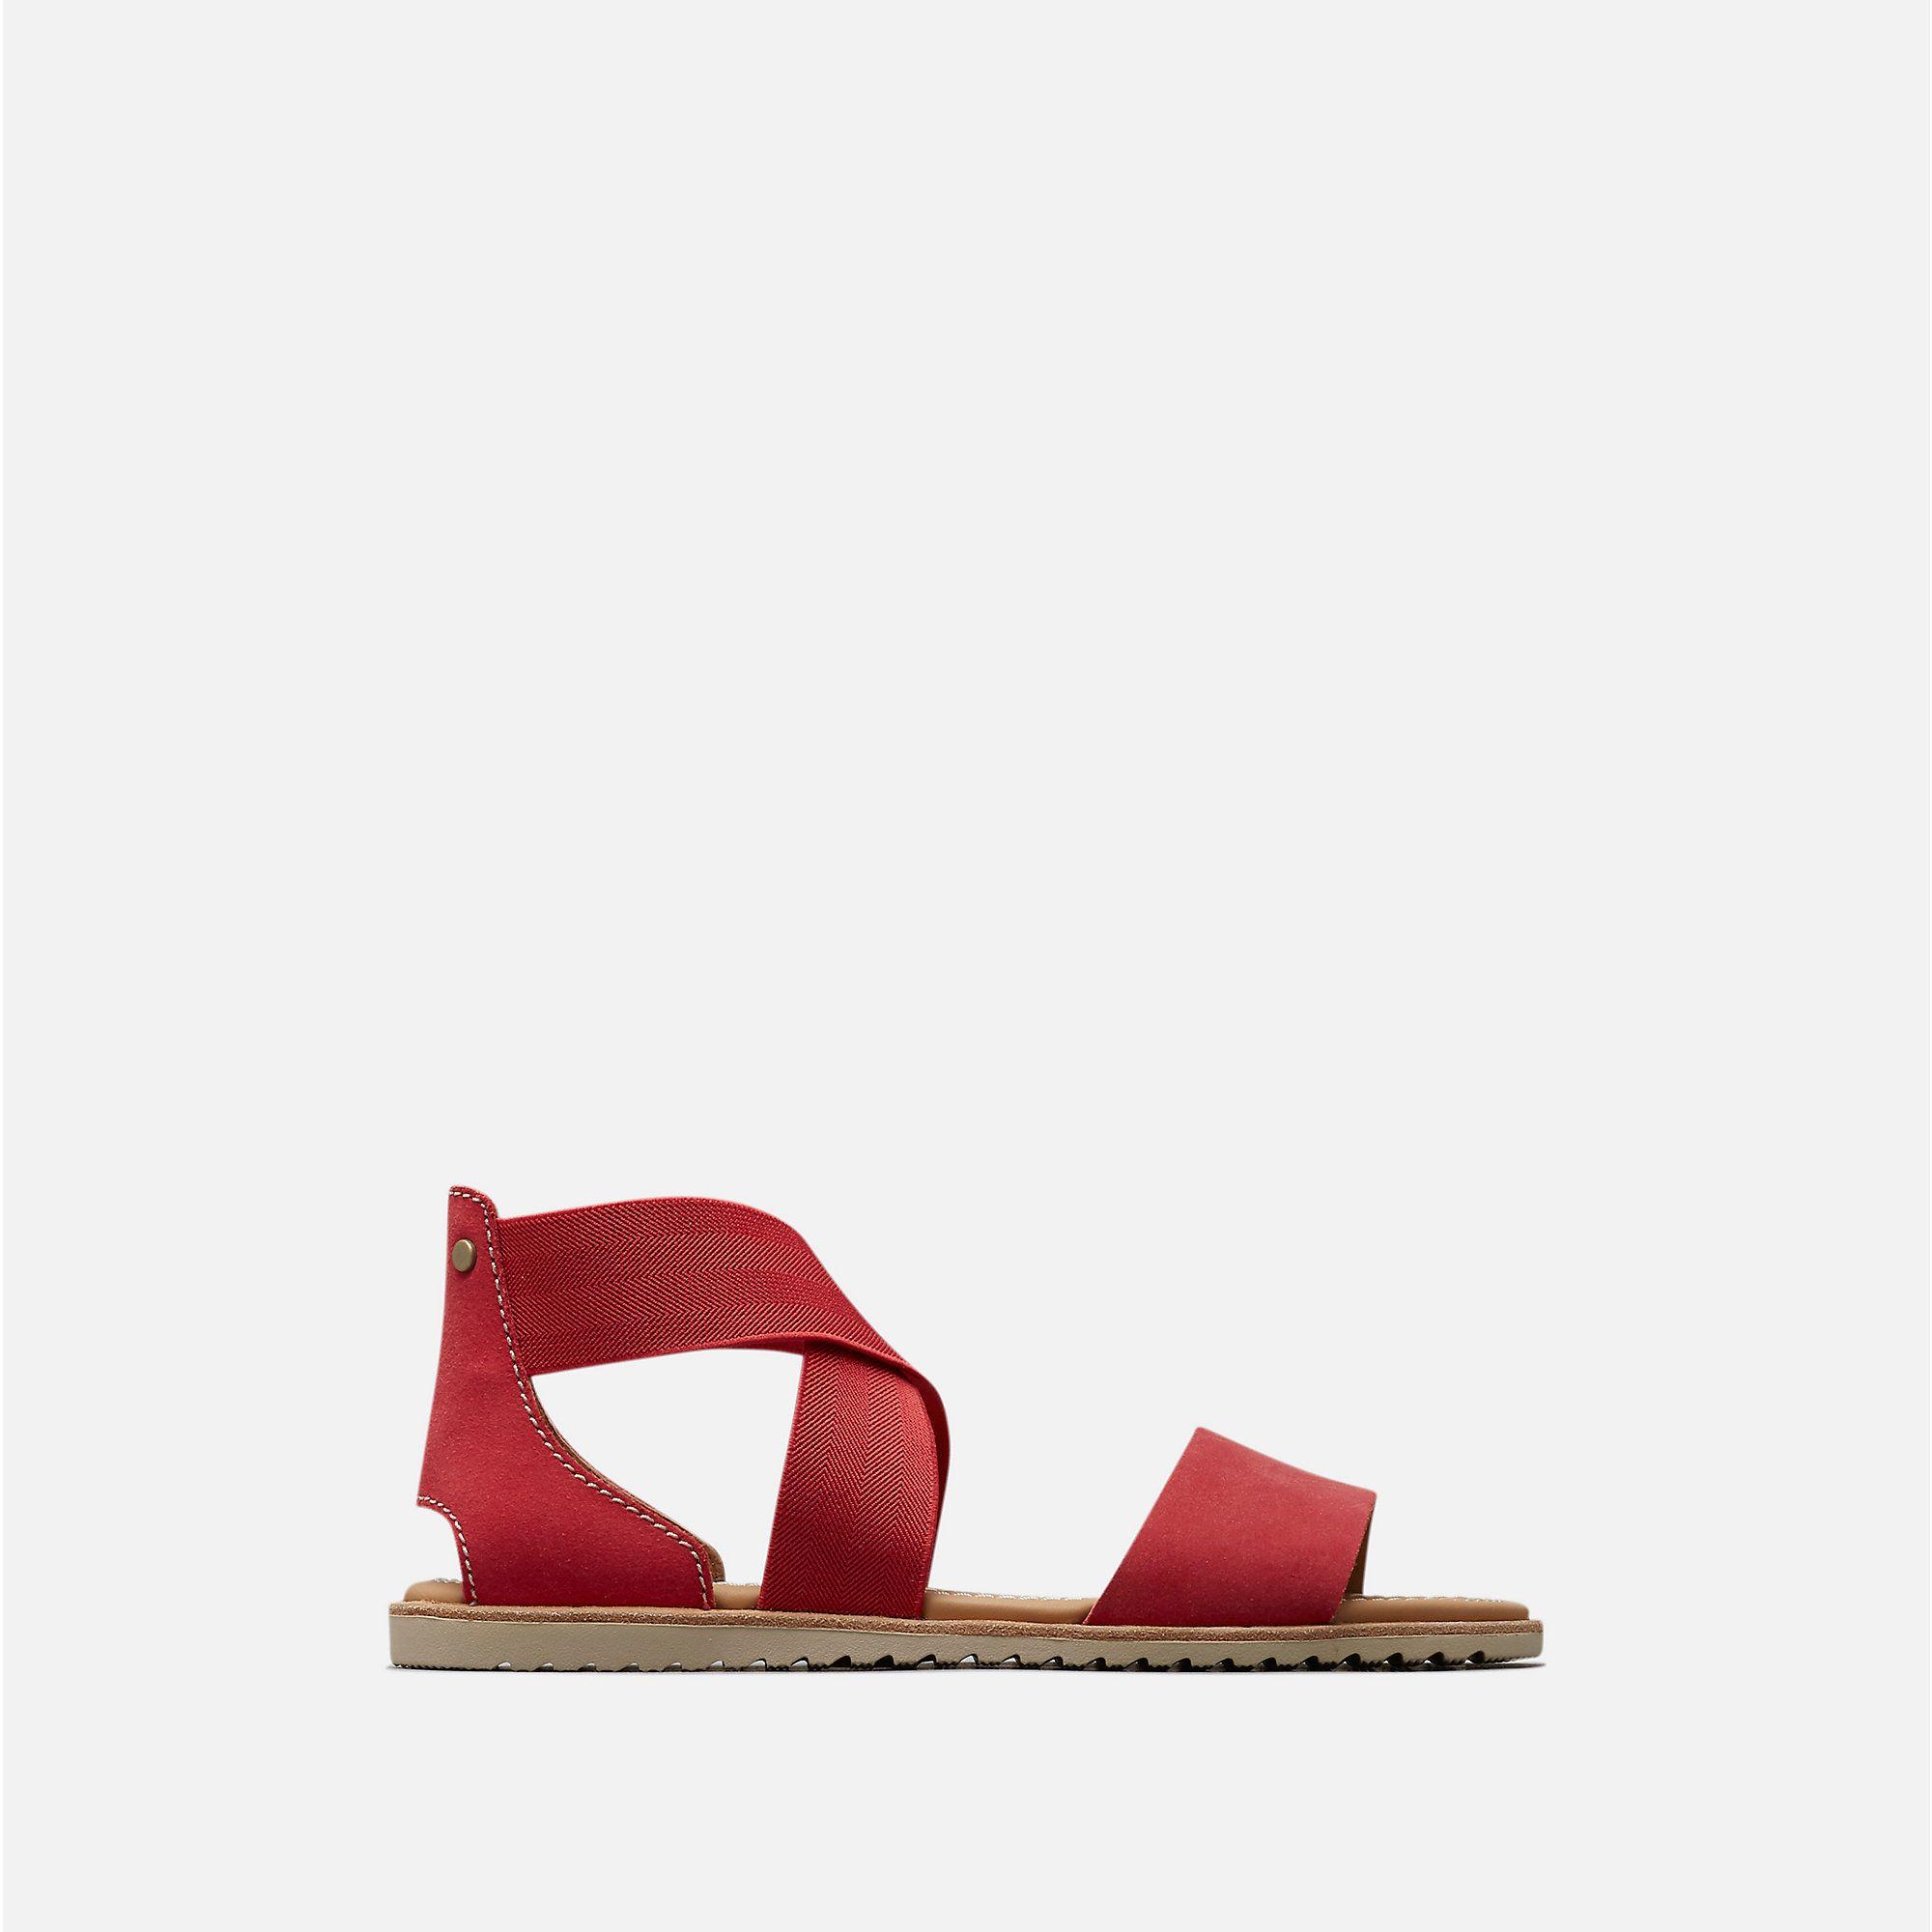 c872f1b42 Sorel Women's Sandals - Sorel Ella Sandal in 2019 | Products ...